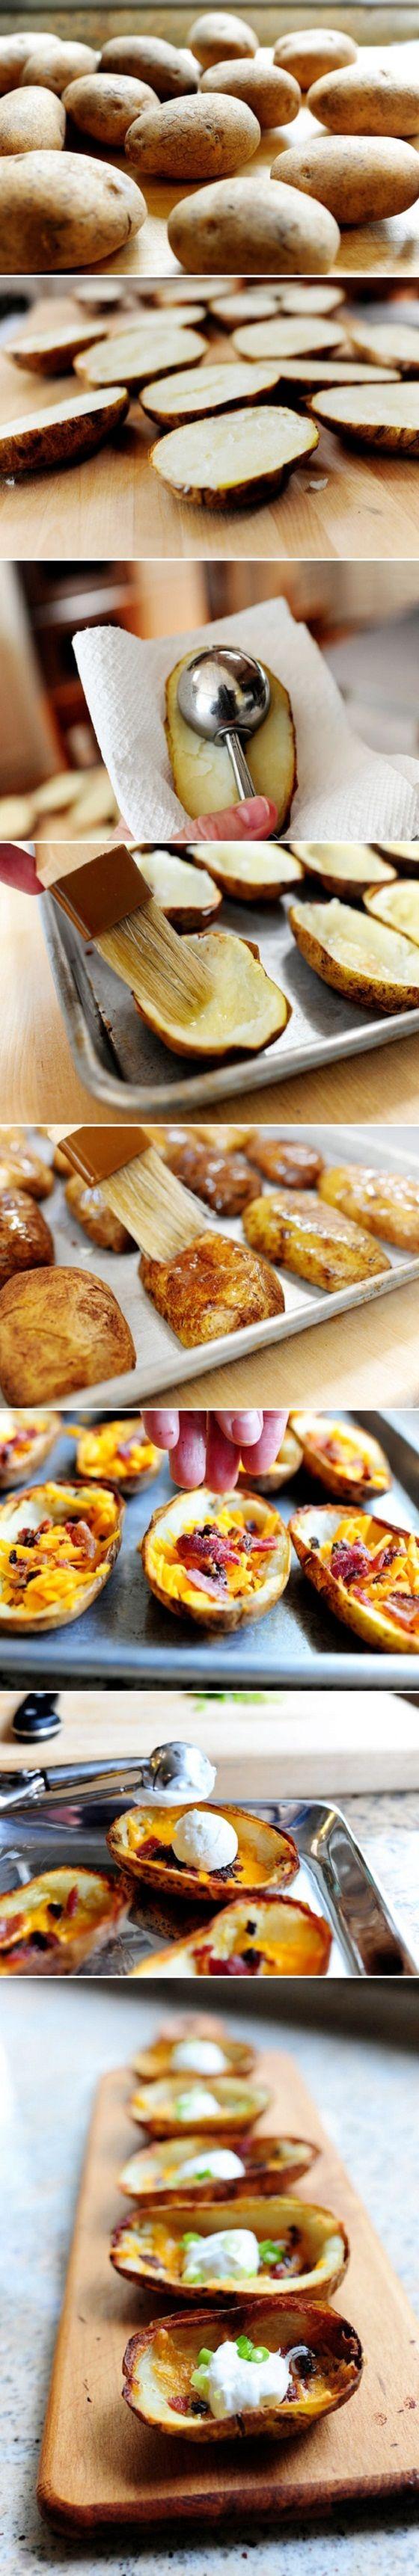 Loaded Baked Potato Skins (use veggie bacon)